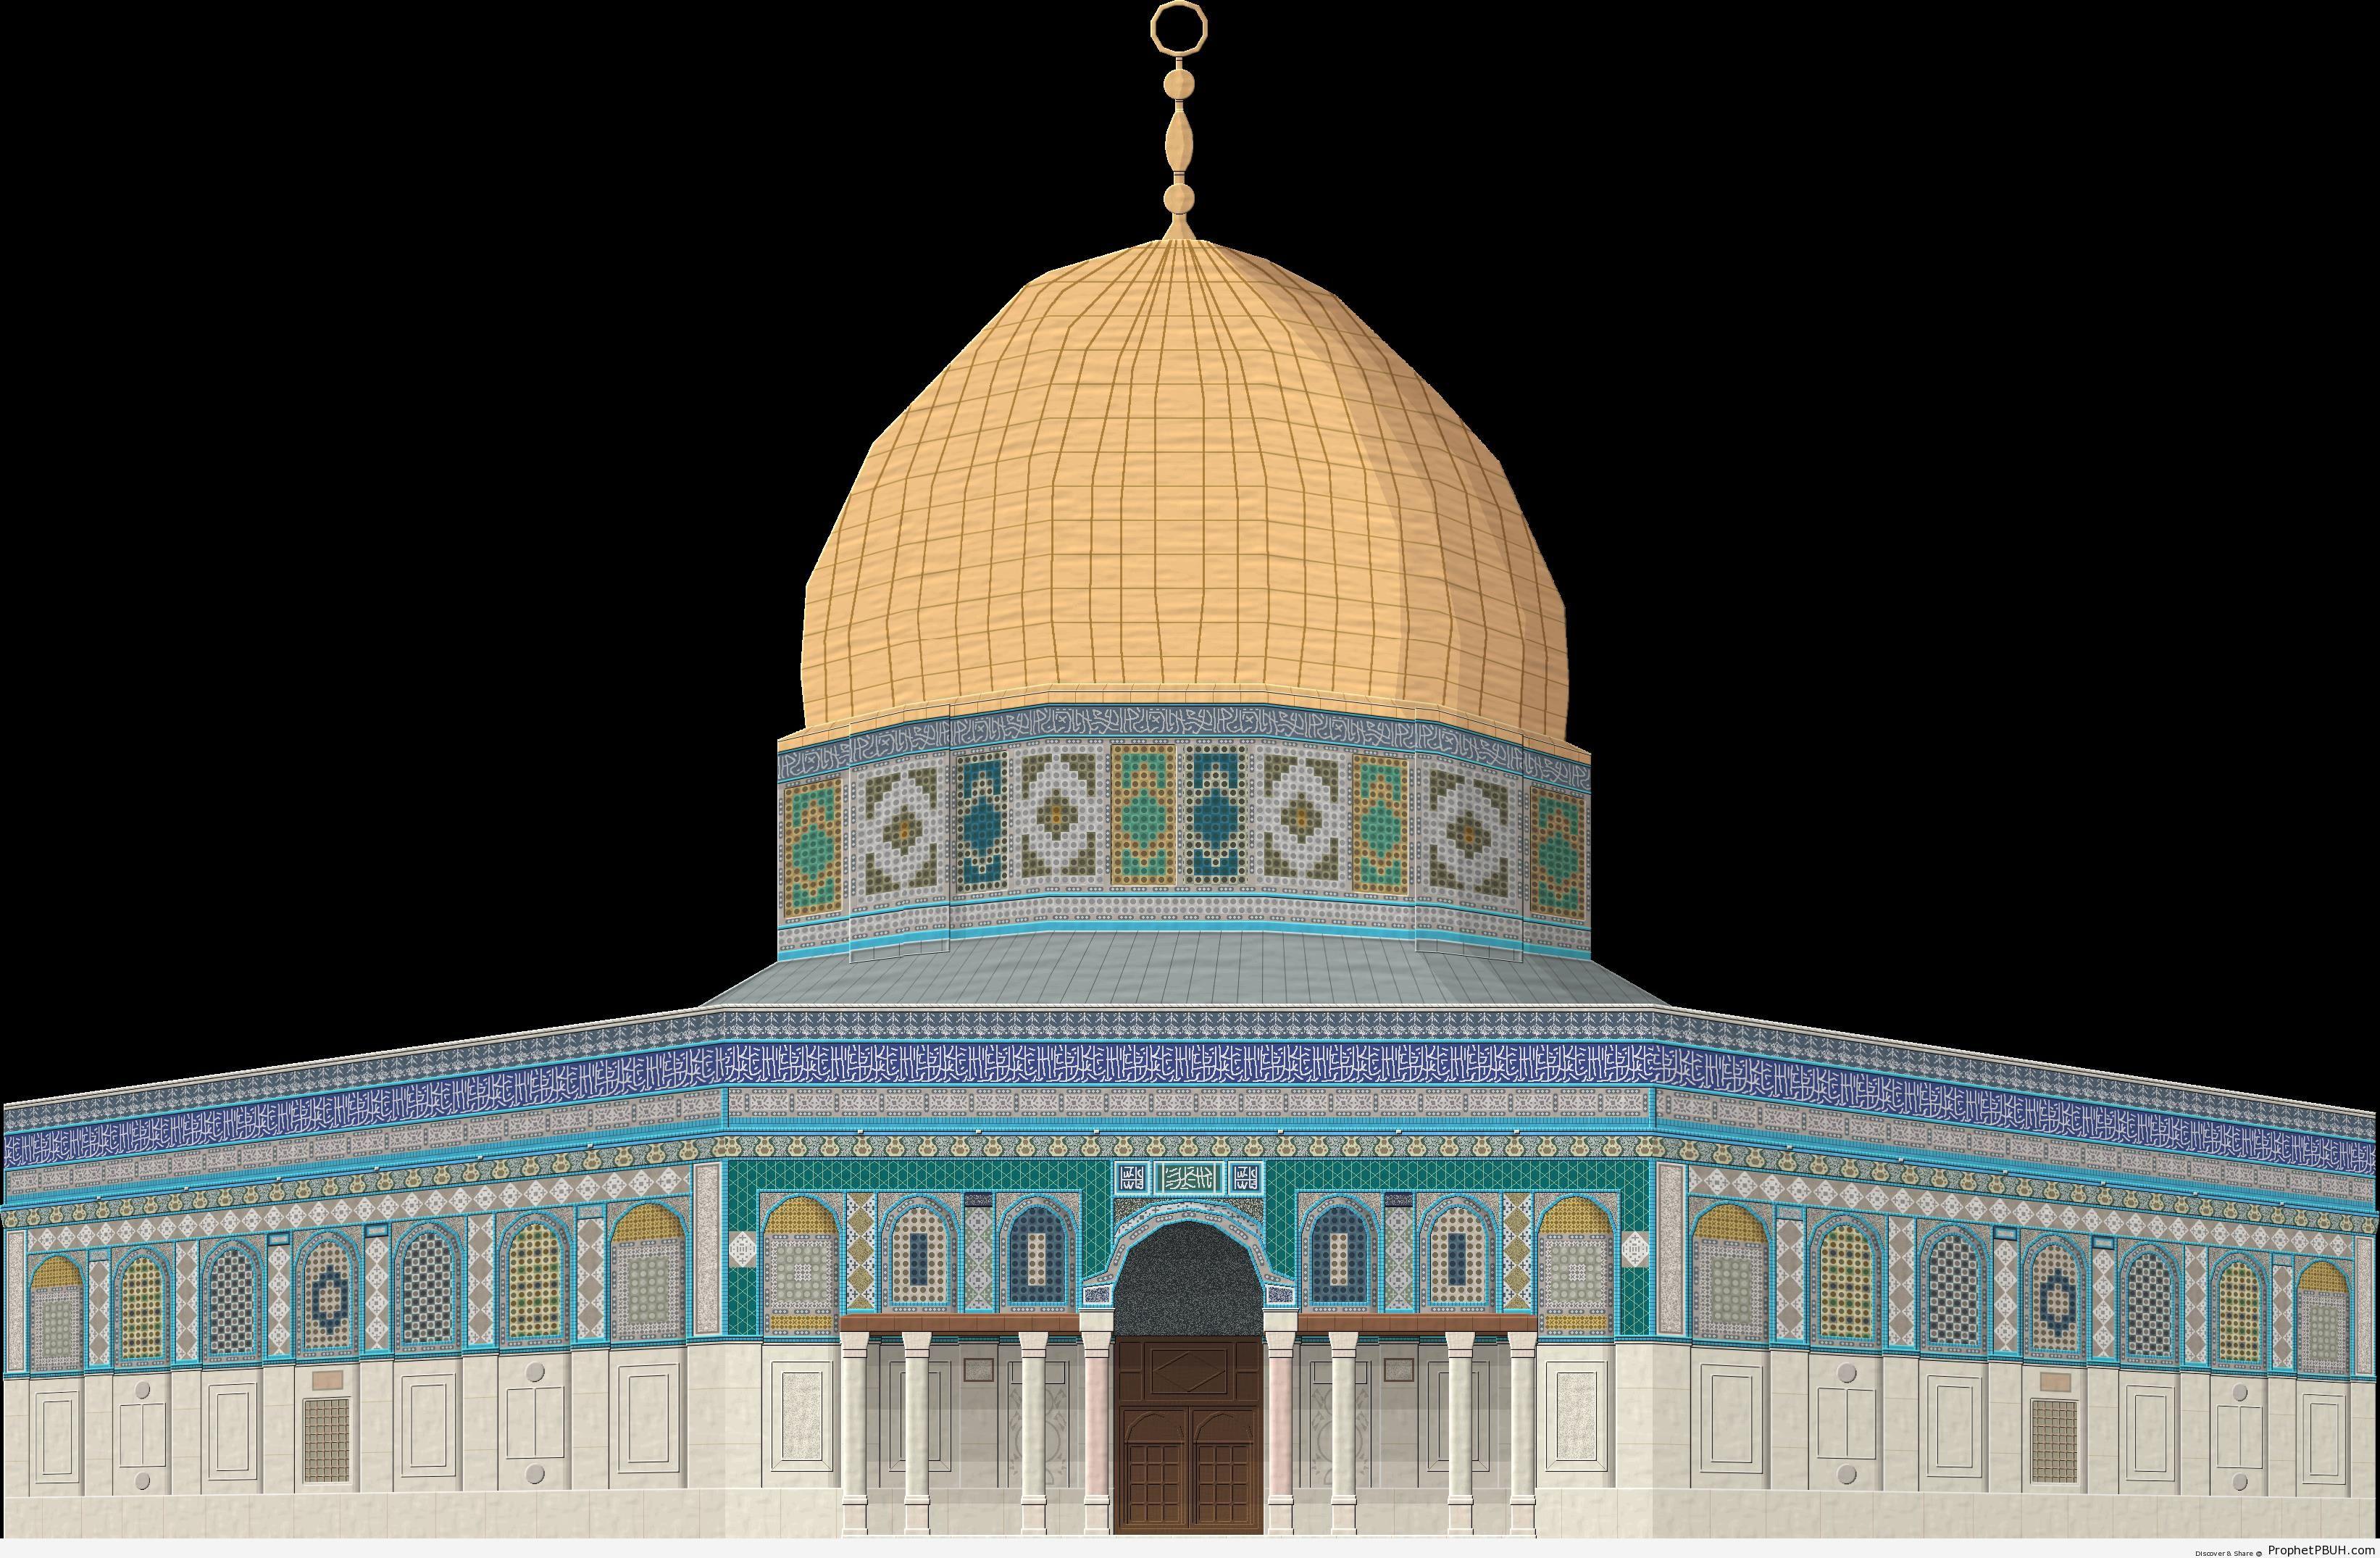 Dome of the Rock Mosque Drawing - Al-Quds (Jerusalem), Palestine